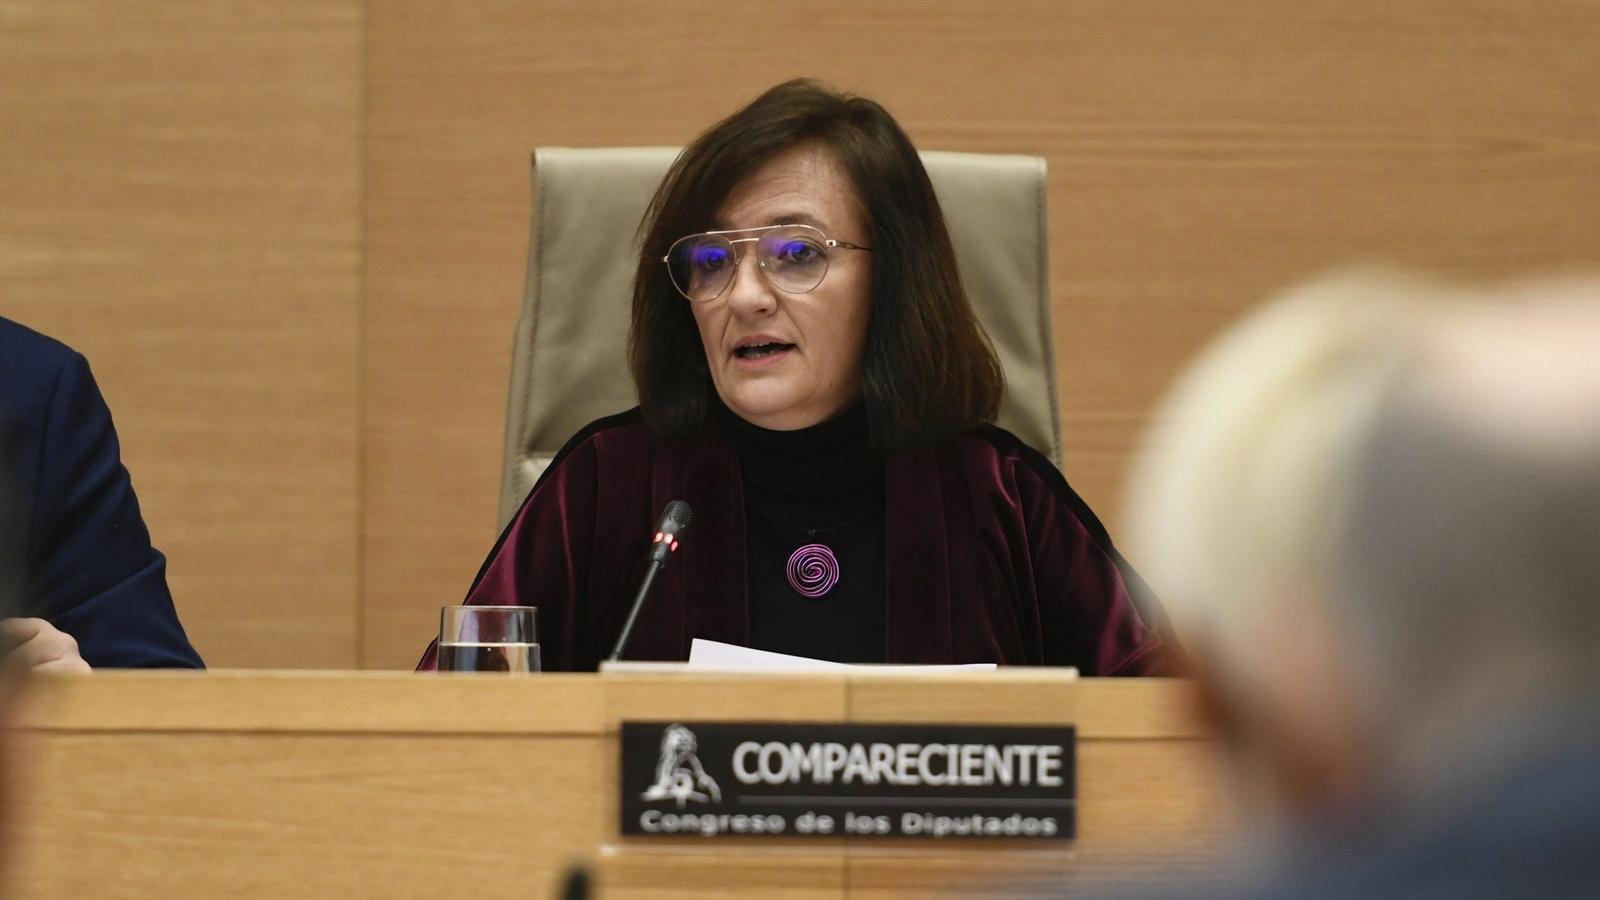 La presidenta d'AIReF, Cristina Herrero